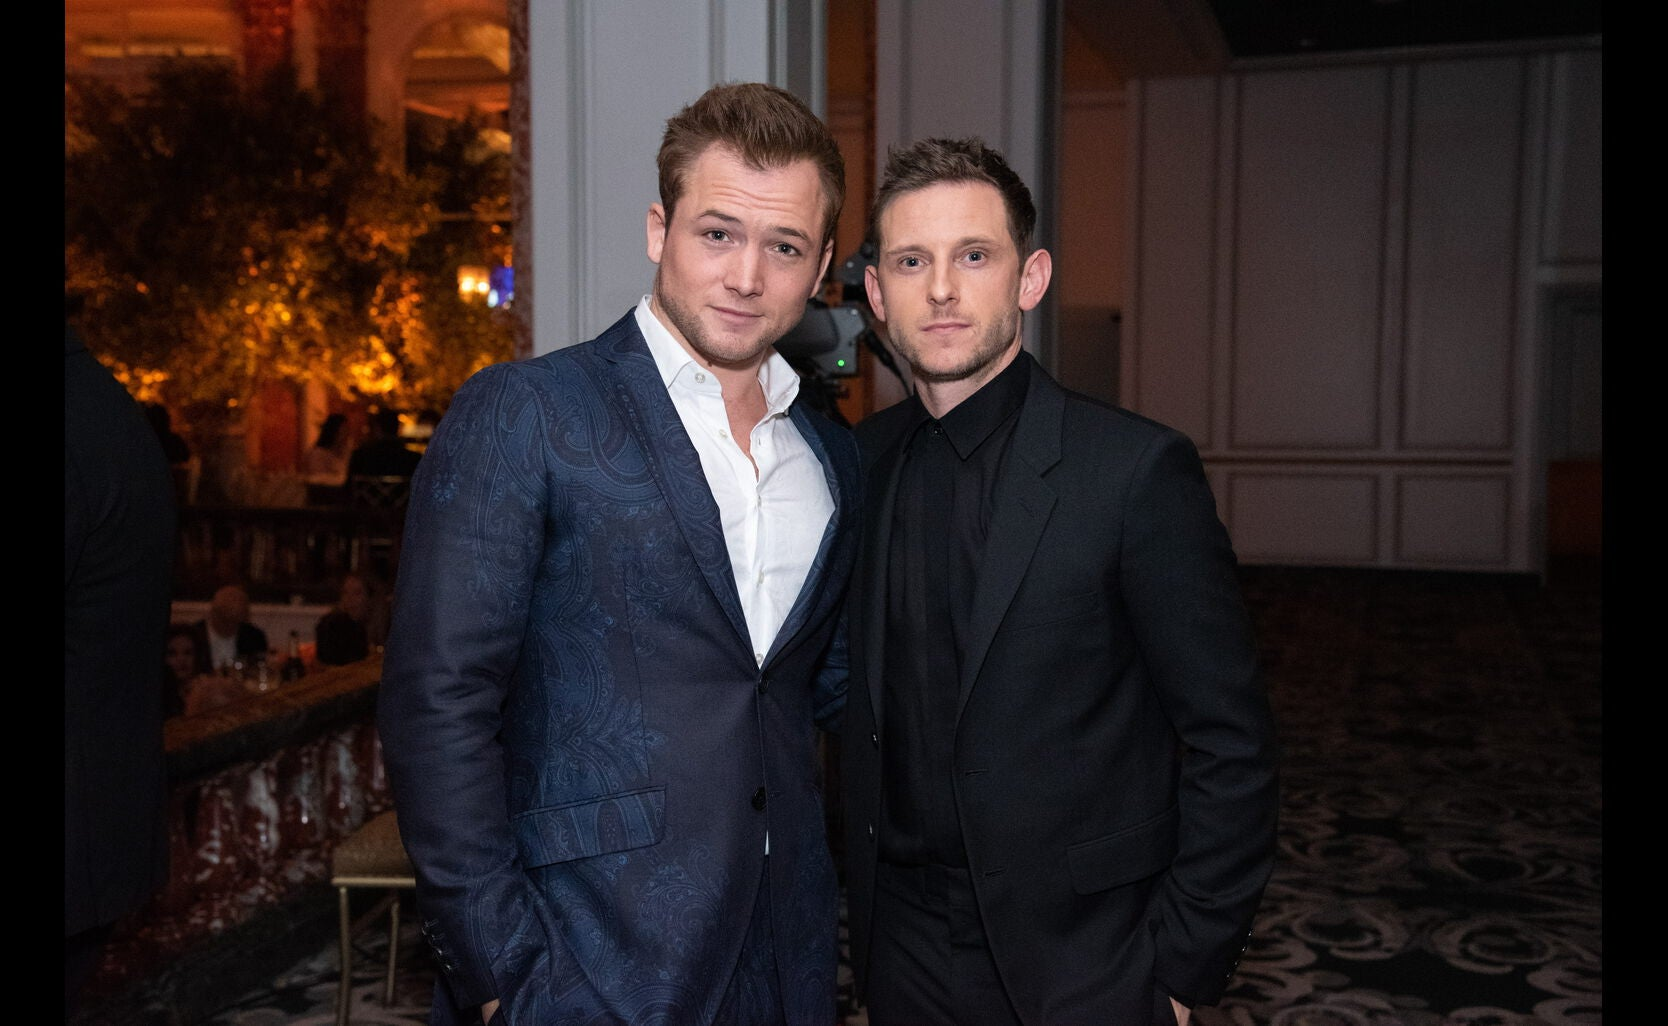 Actors Jamie Bell and Taron Egerton at the 2019 HFPA Grants banquet